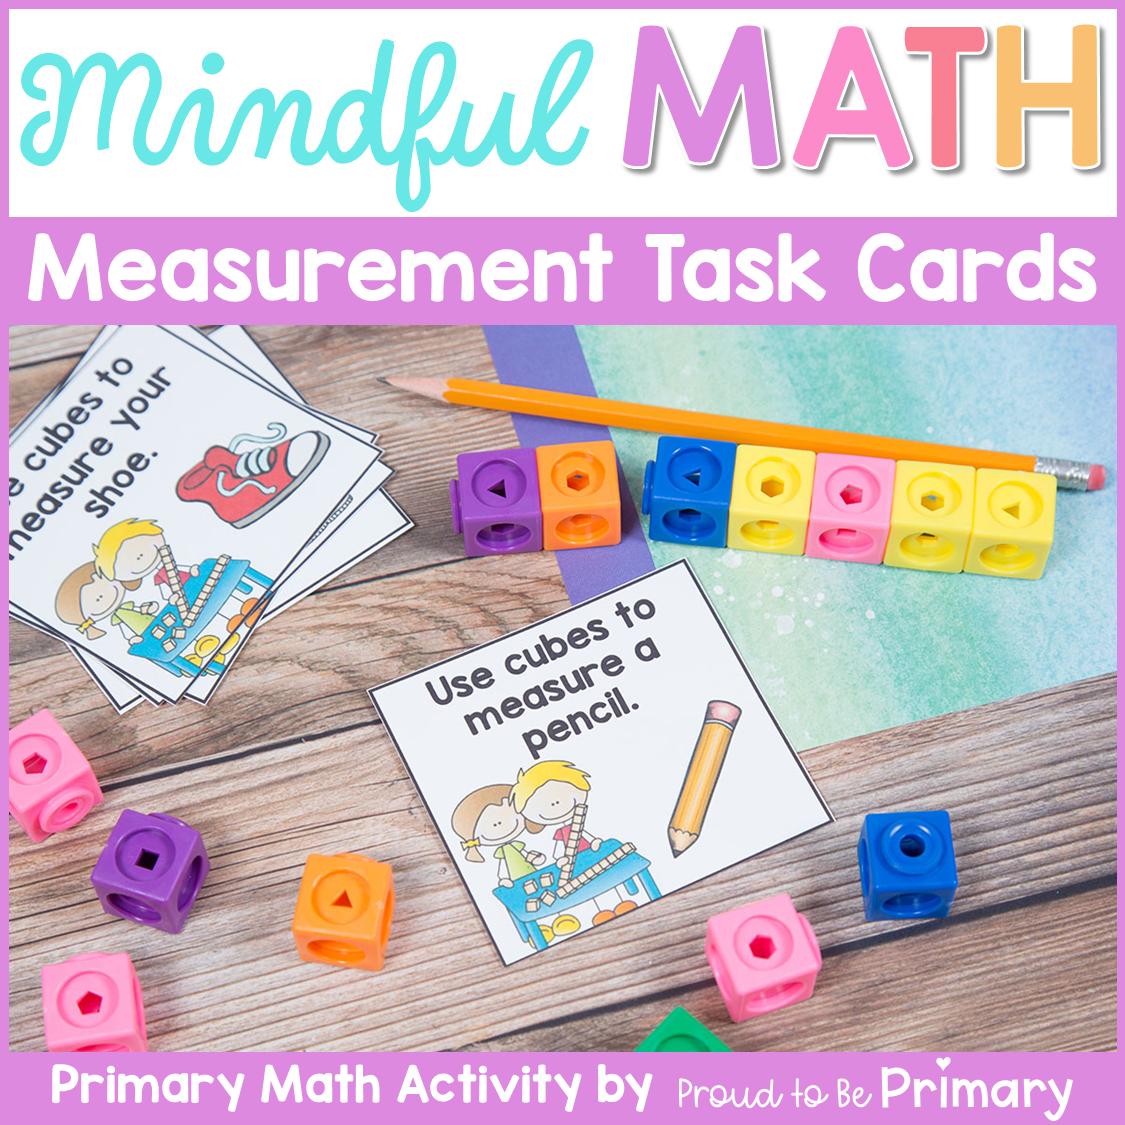 Mindful Math Measurement Task Cards